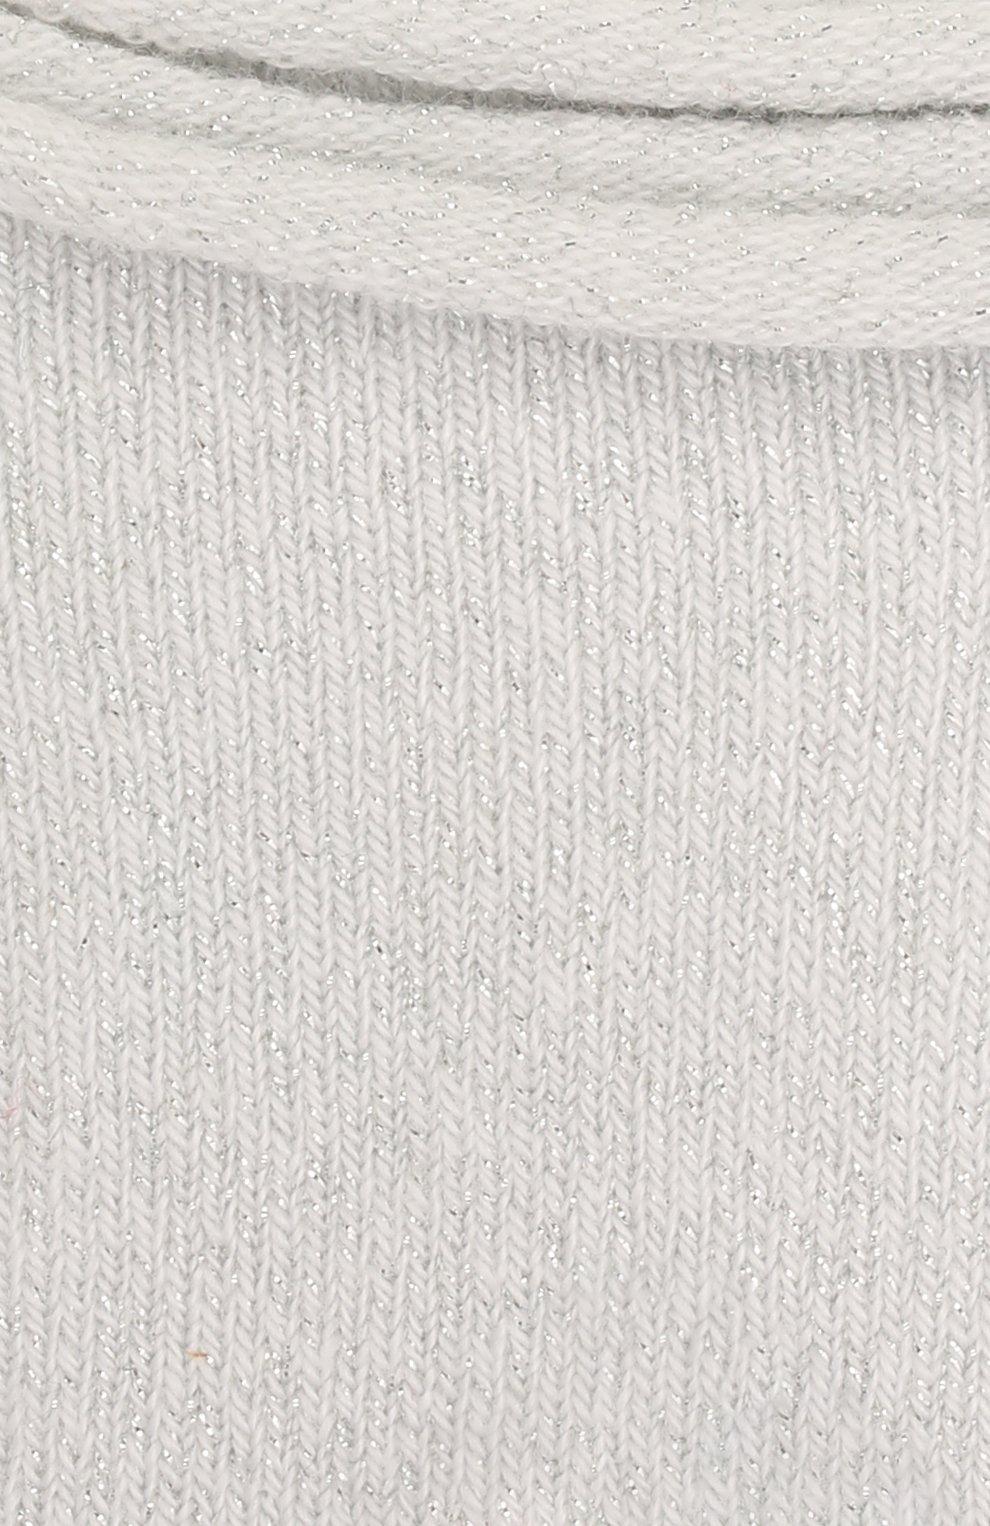 Детские носки FALKE белого цвета, арт. 12174.   Фото 2 (Материал: Текстиль, Хлопок)